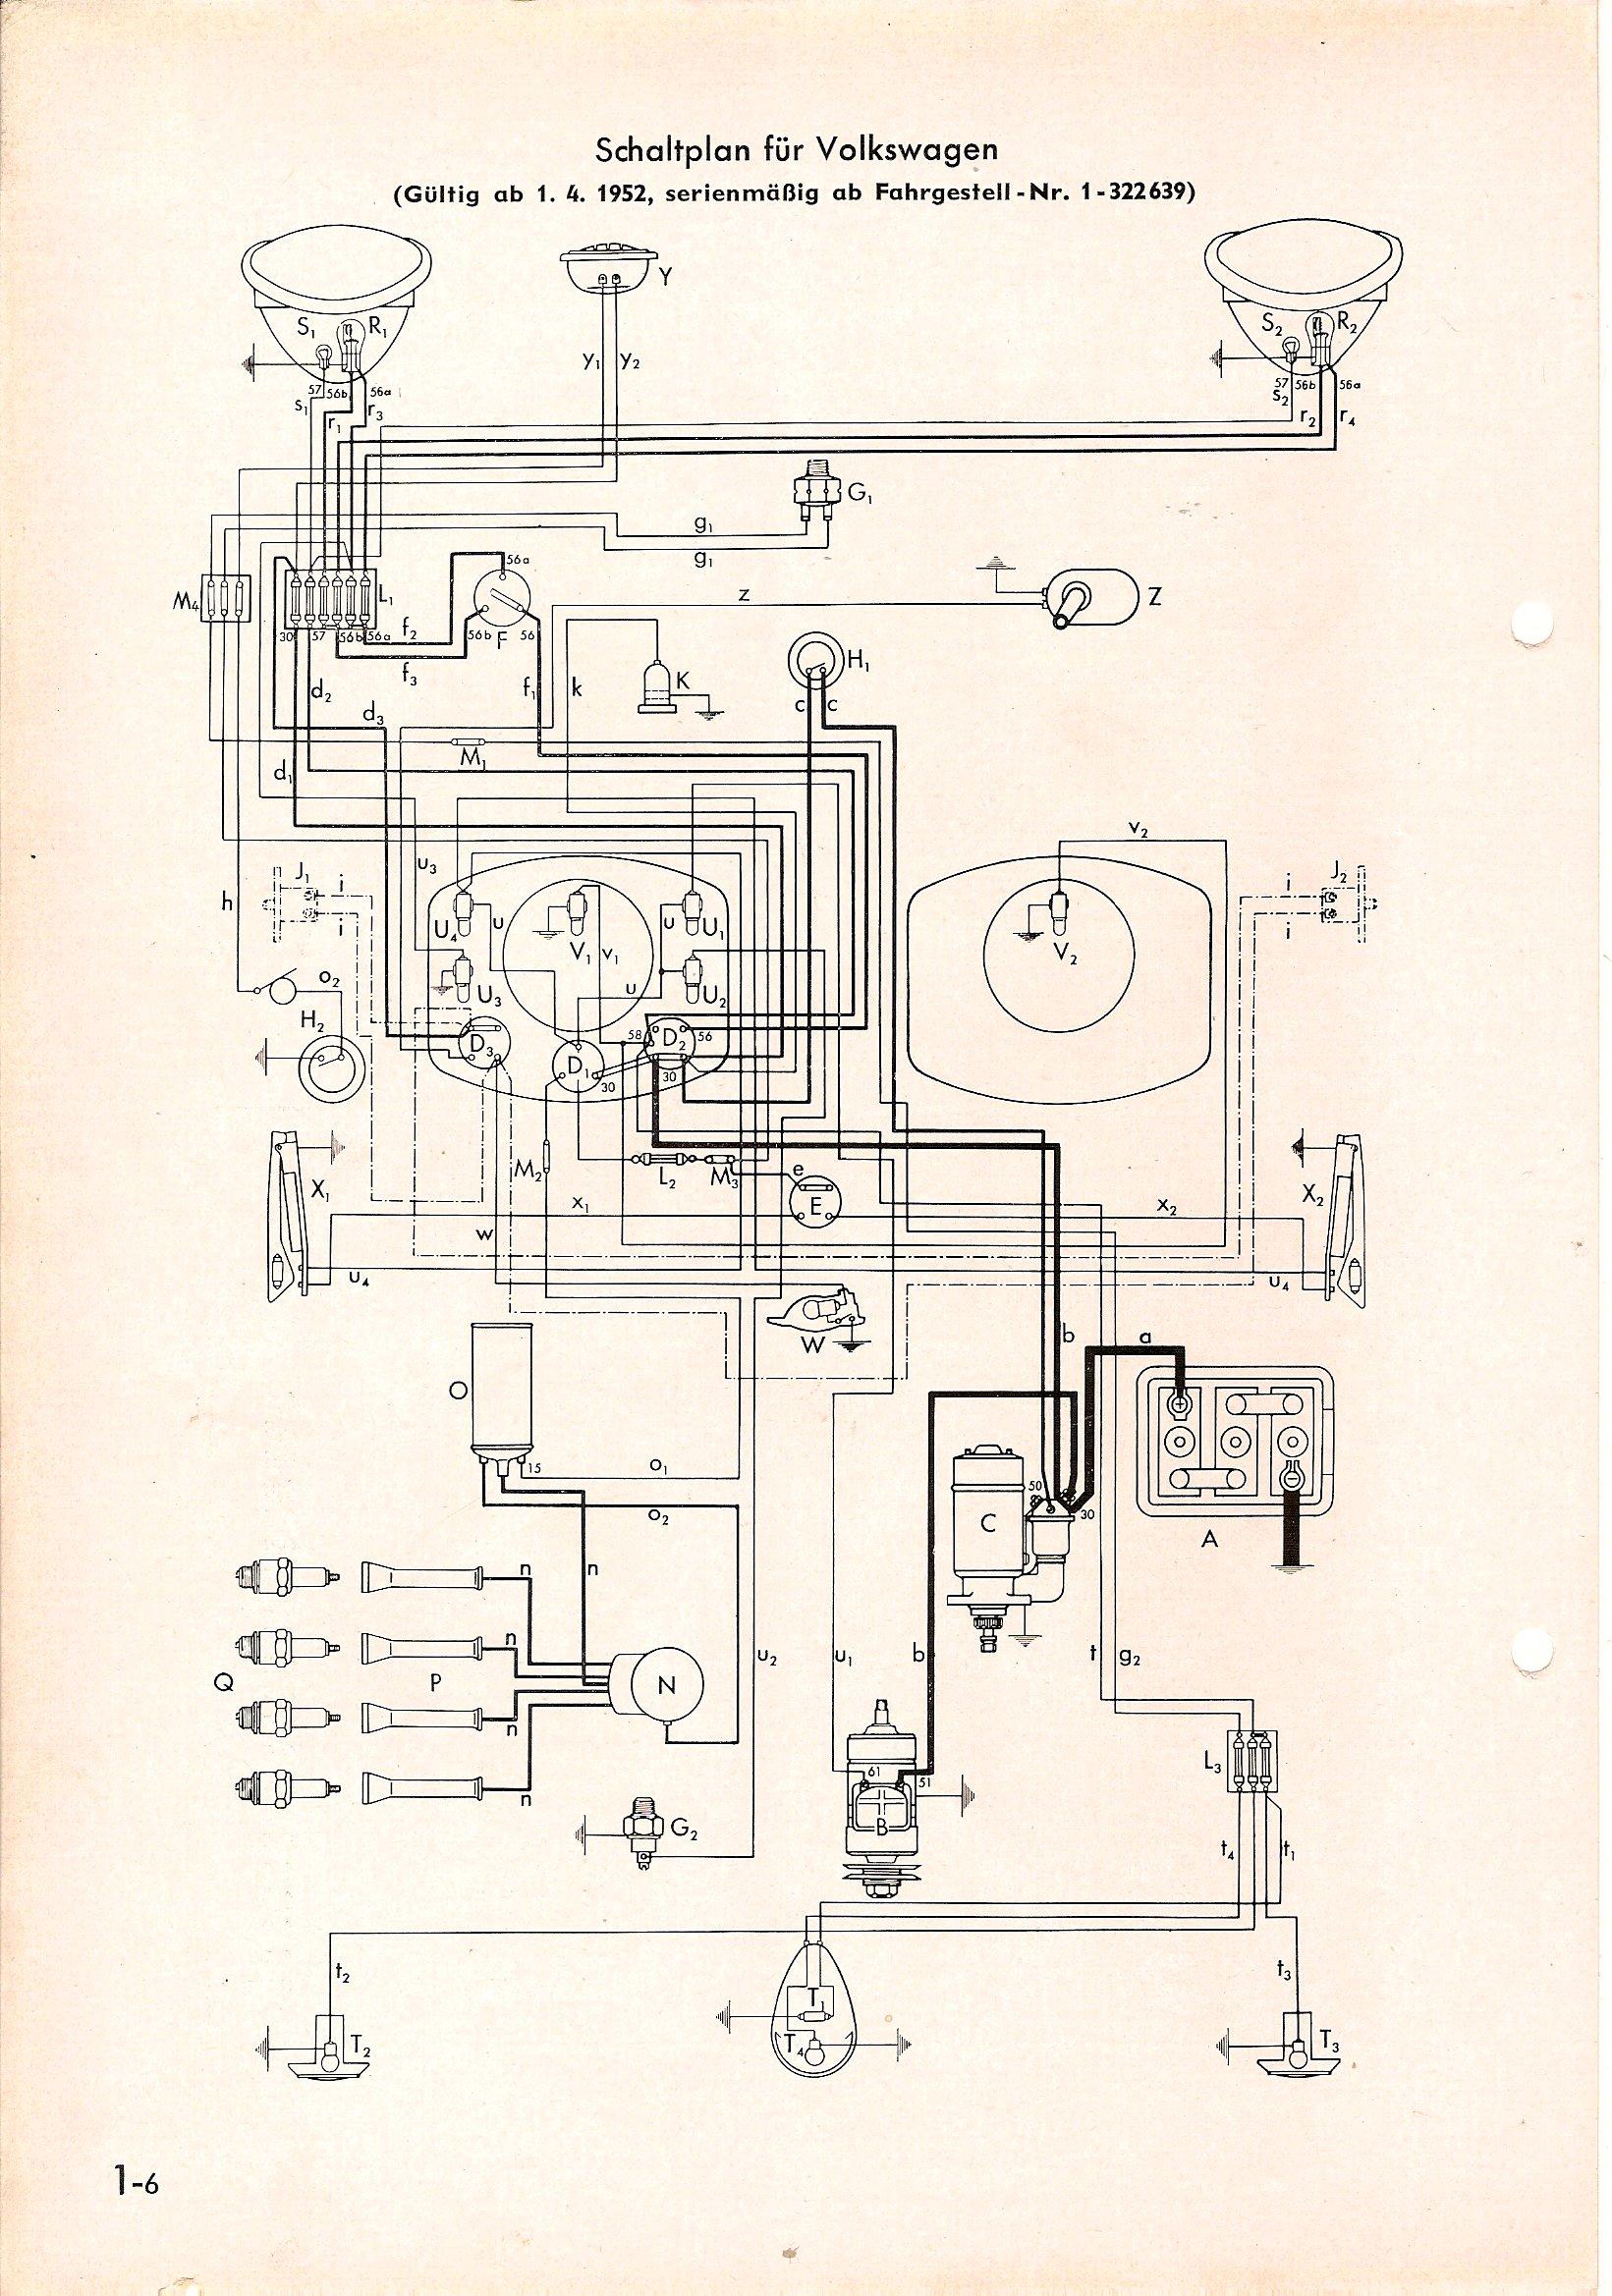 1956 Bentley Wiring Diagram Info From